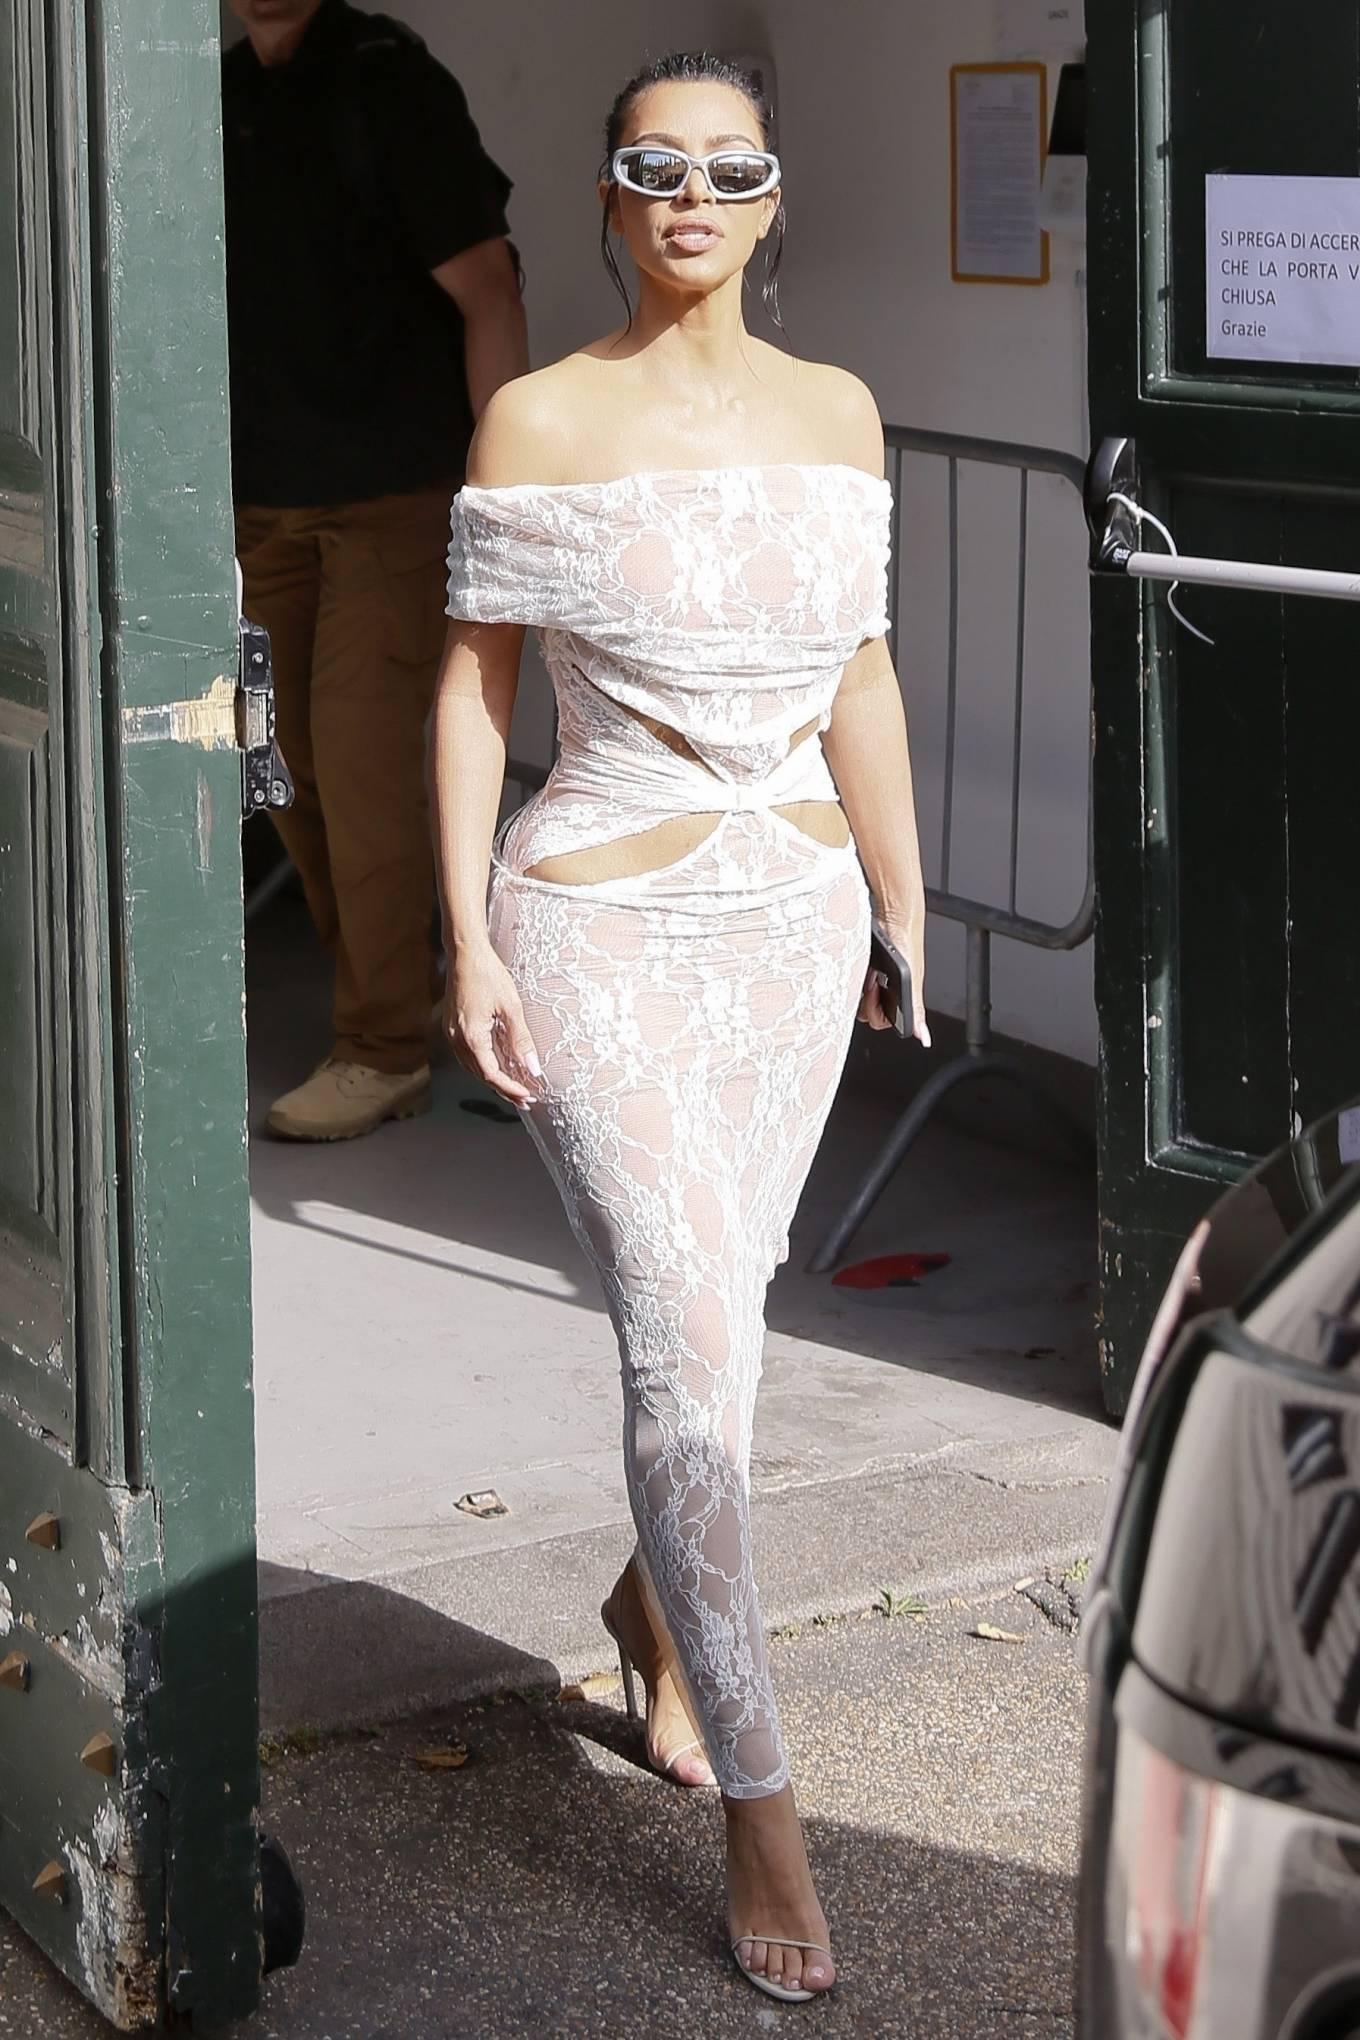 Kim Kardashian donning sharp white sandals with high heel